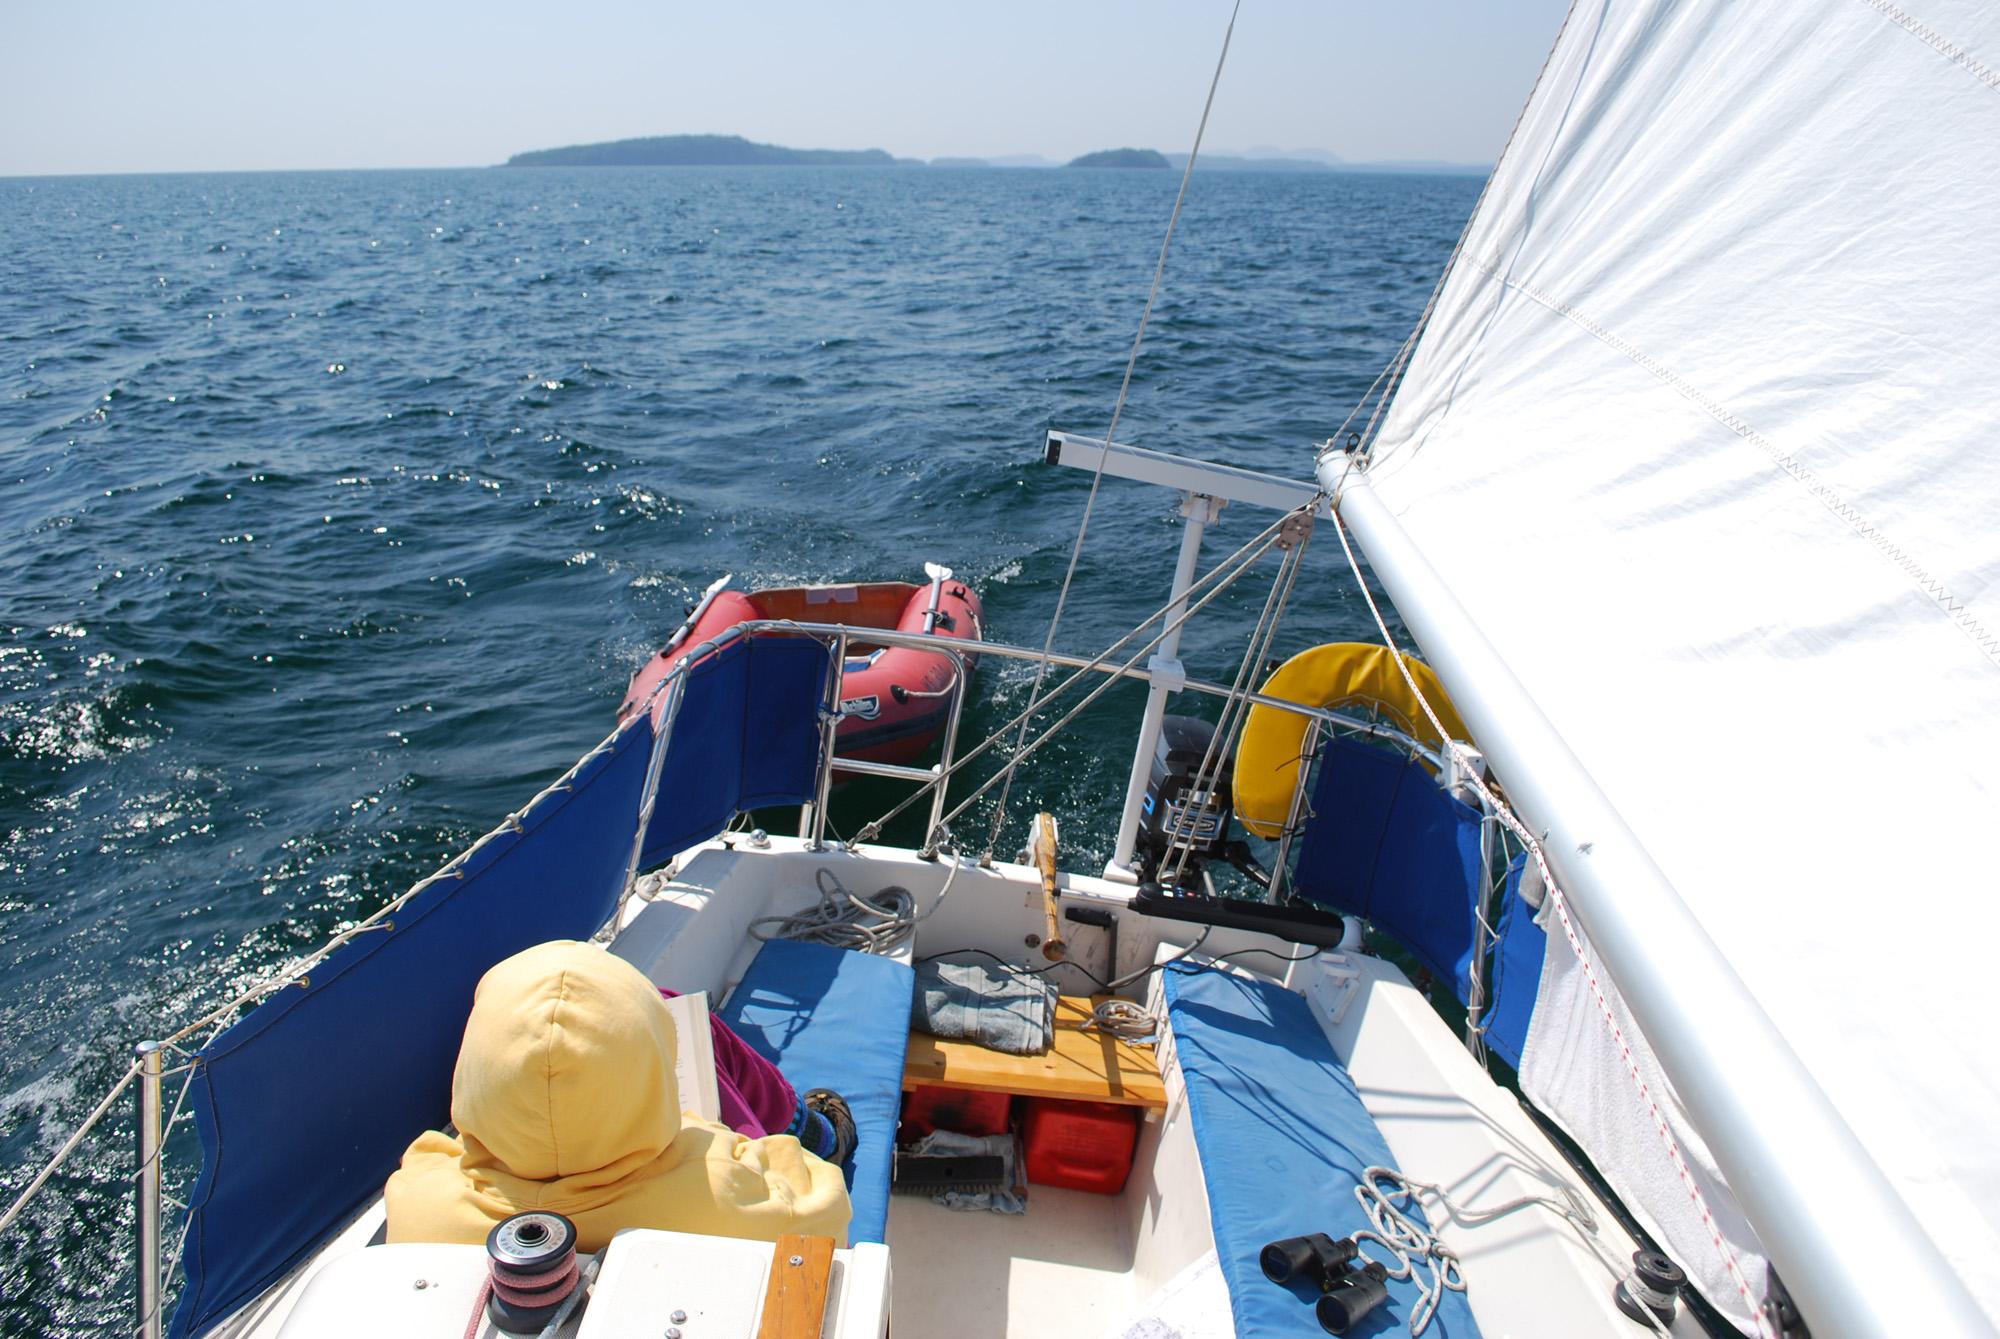 Lake Superior 2014 029.jpg a.jpg